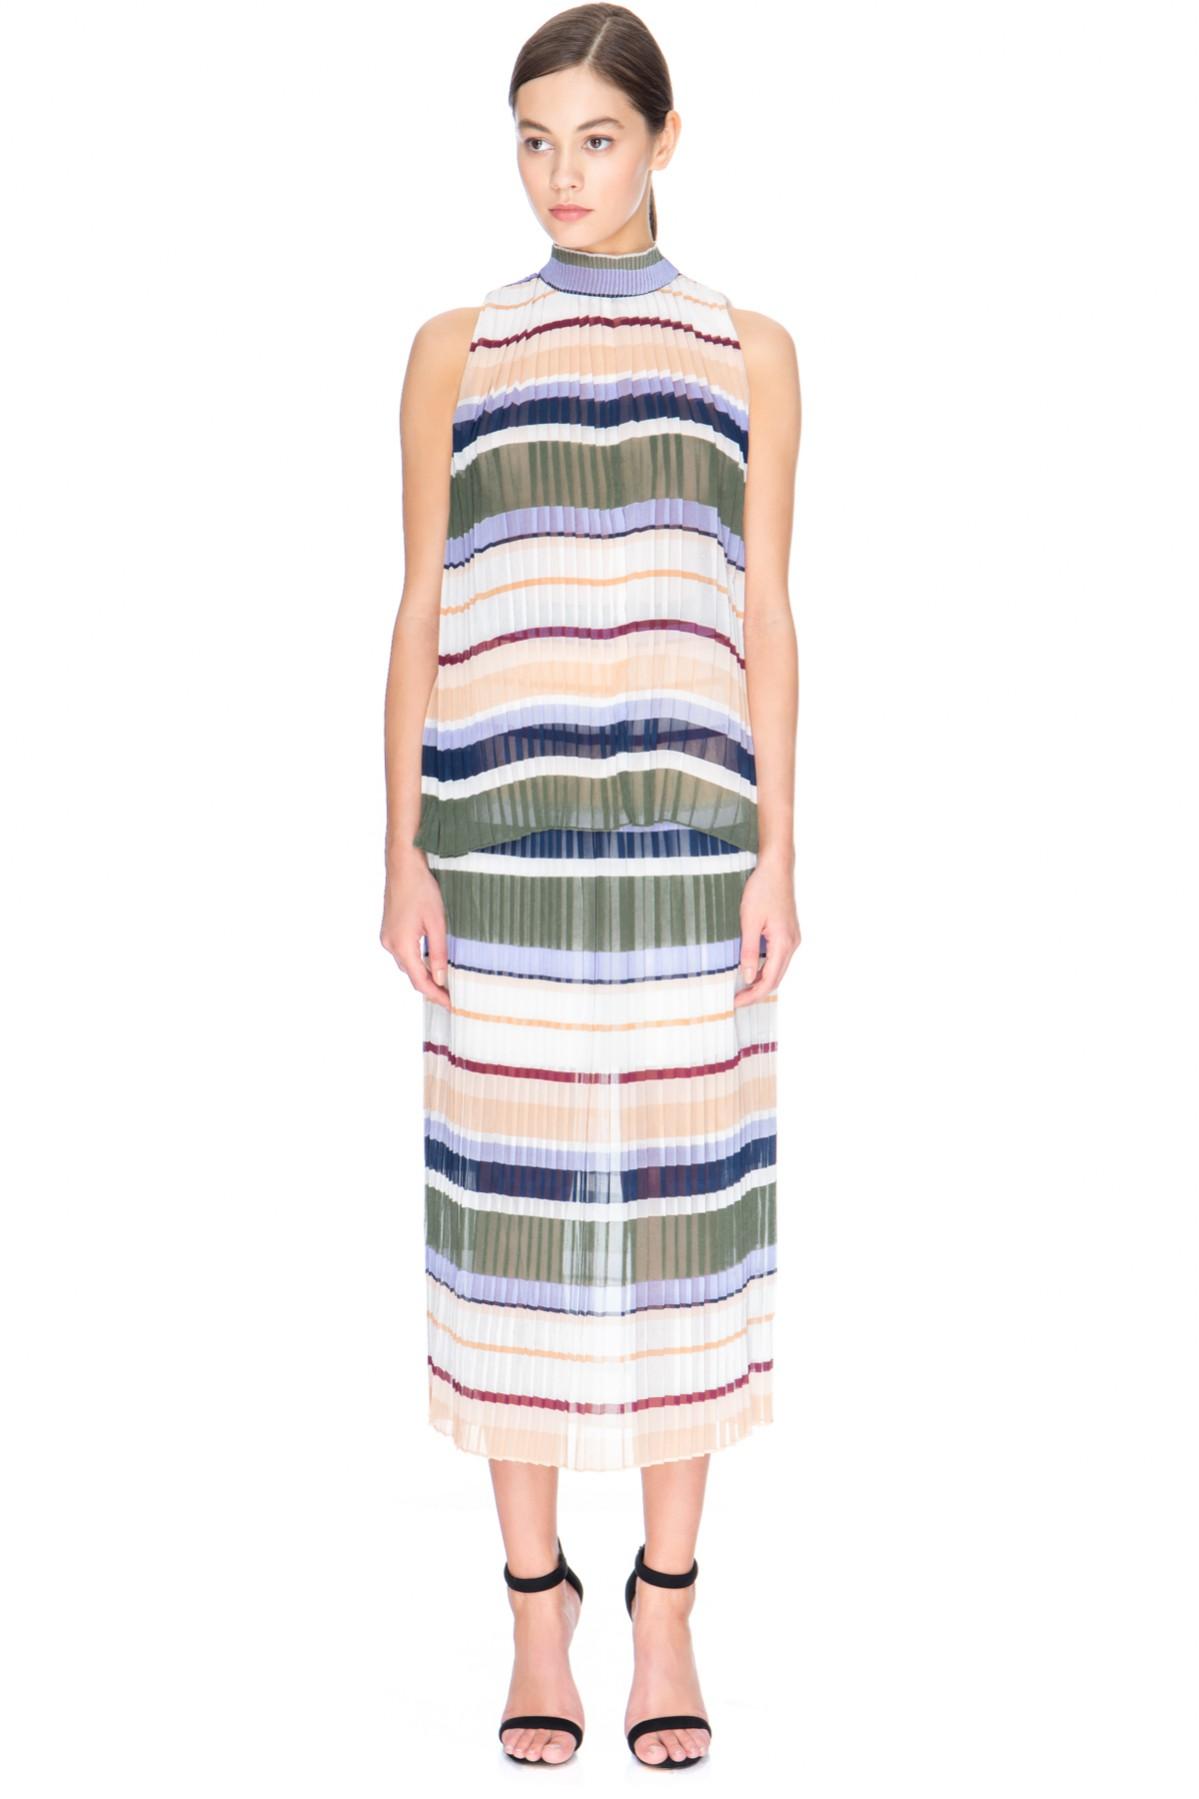 Shop Keepsake Melody Top + Skirt.